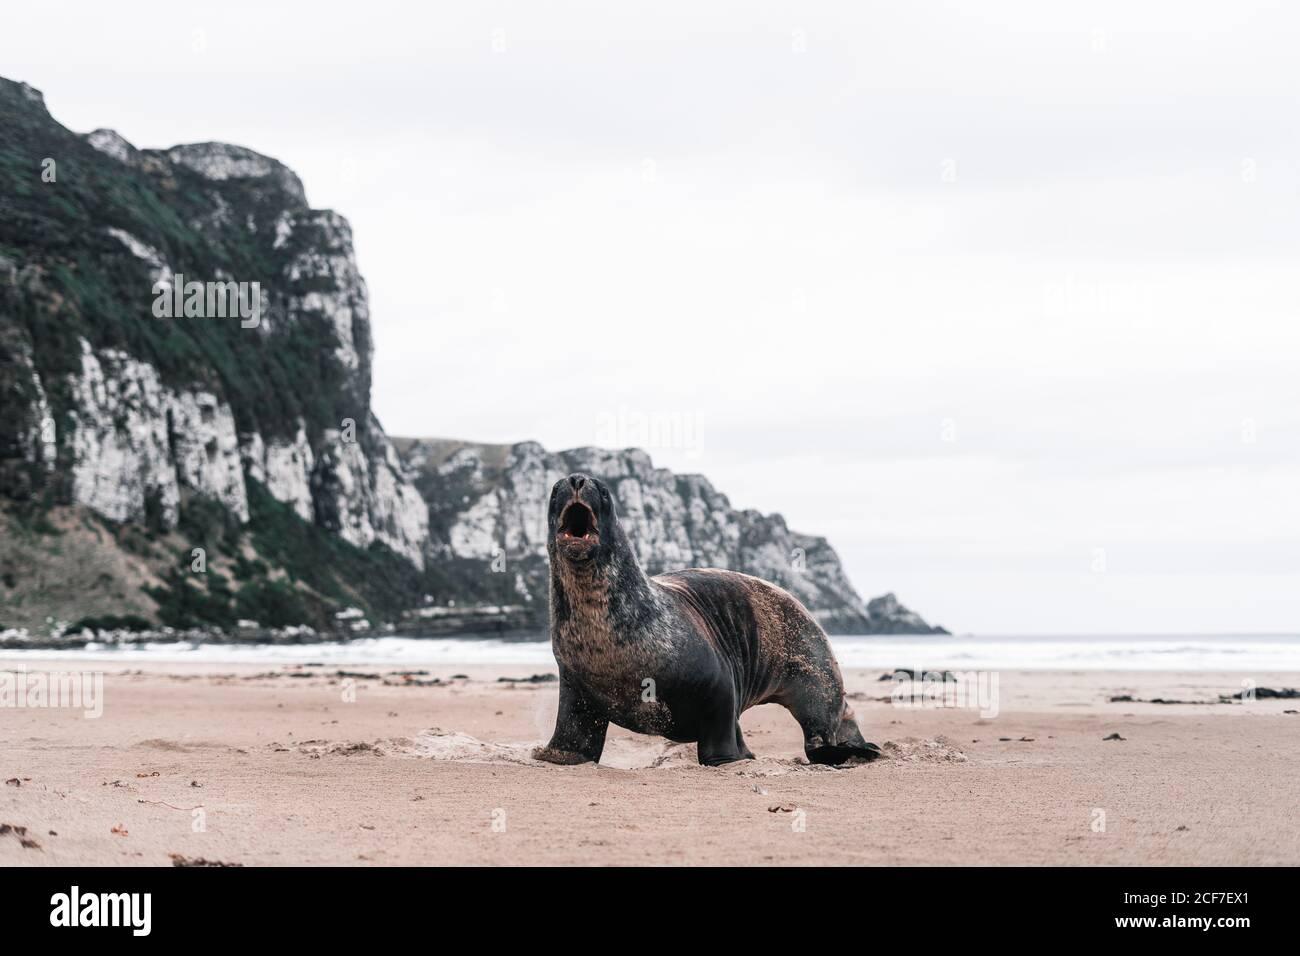 Big screaming seal on rocky shore in Purakaunui, New Zealand in cloudy day Stock Photo